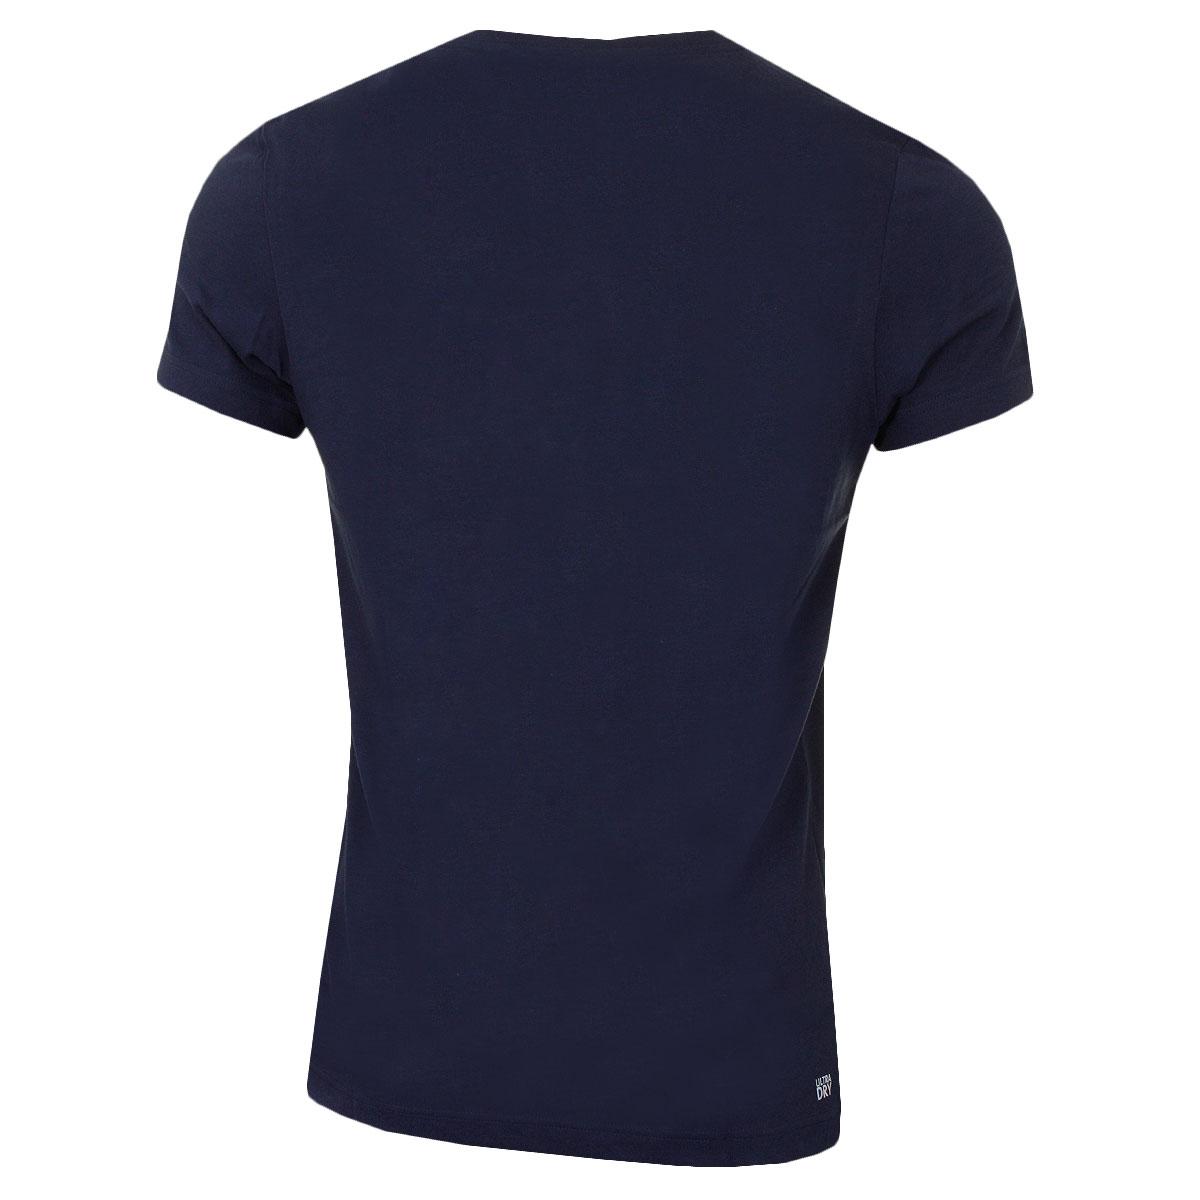 Lacoste-Mens-Oversized-Crocodile-Ultra-Dry-Cotton-Blend-T-Shirt-30-OFF-RRP thumbnail 10